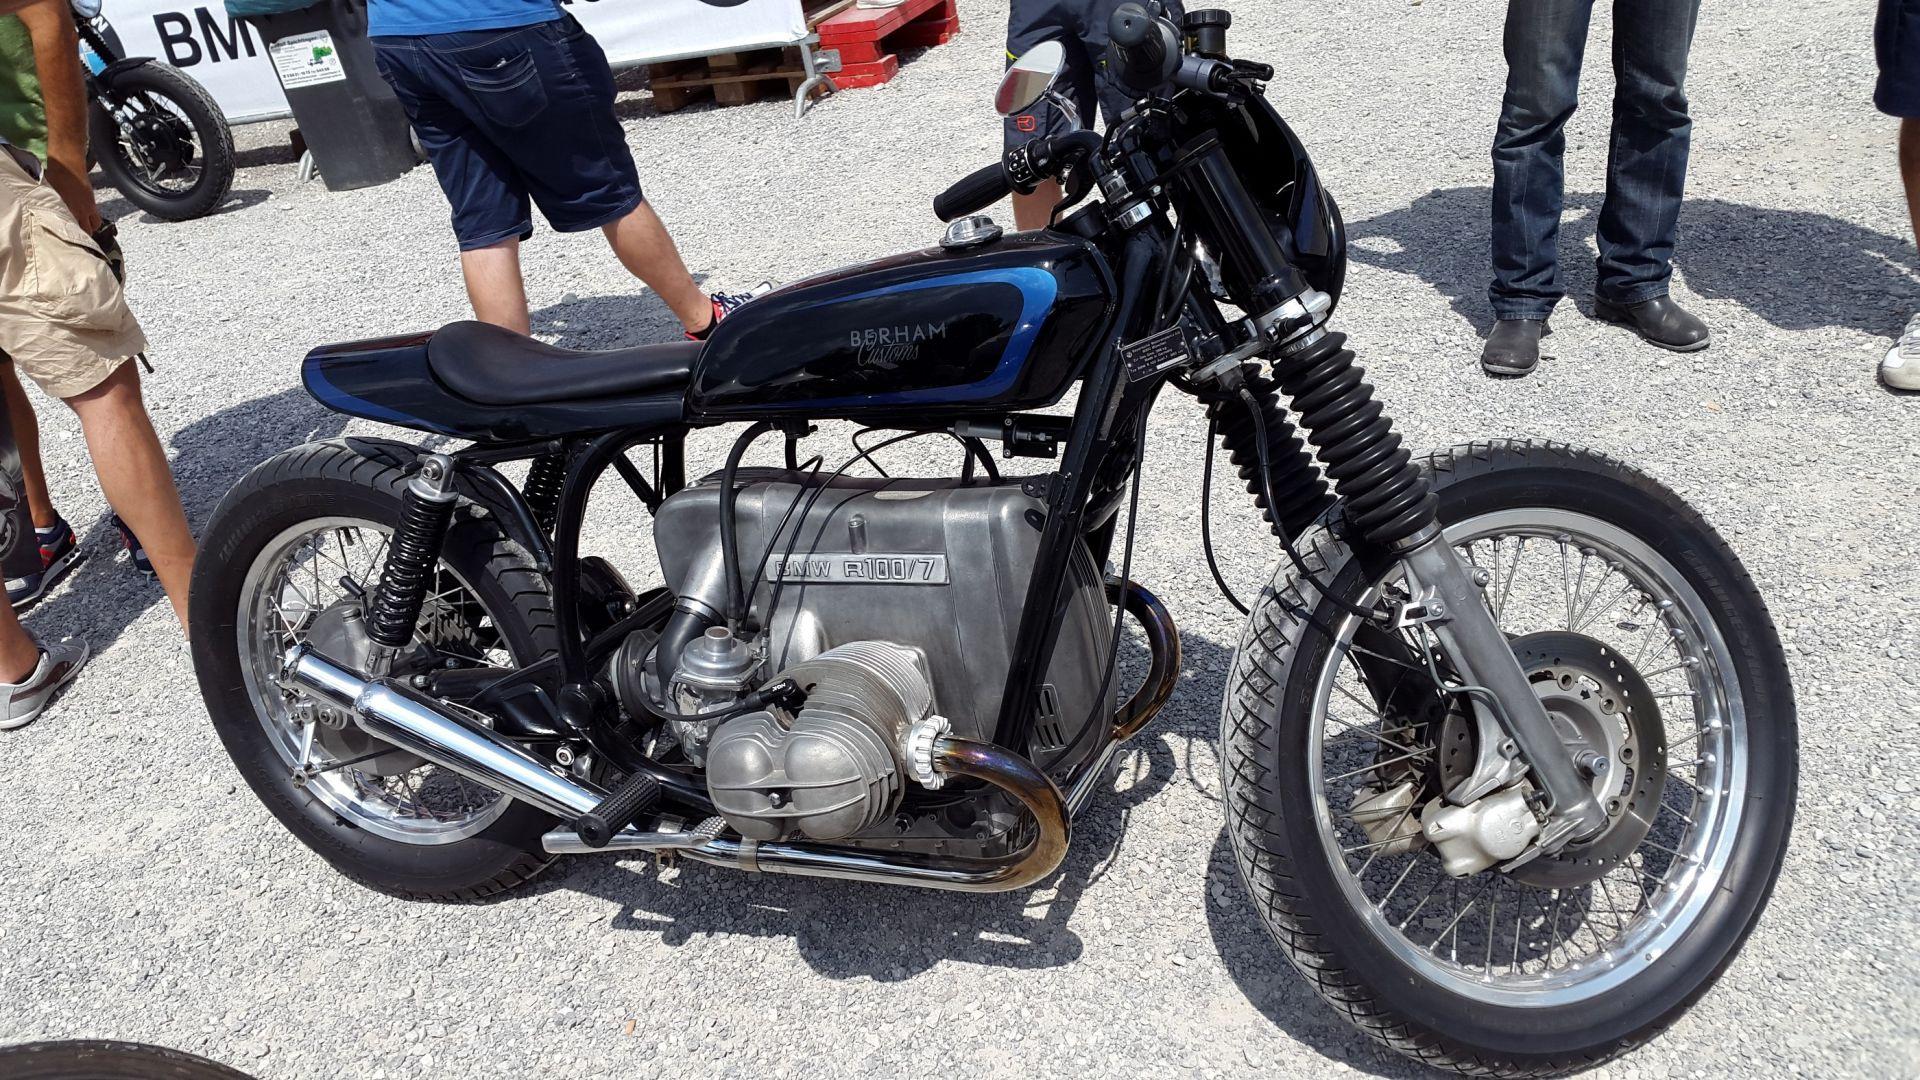 Eventi Bmw Motorrad Days 2015 Anche In Video Motorbox